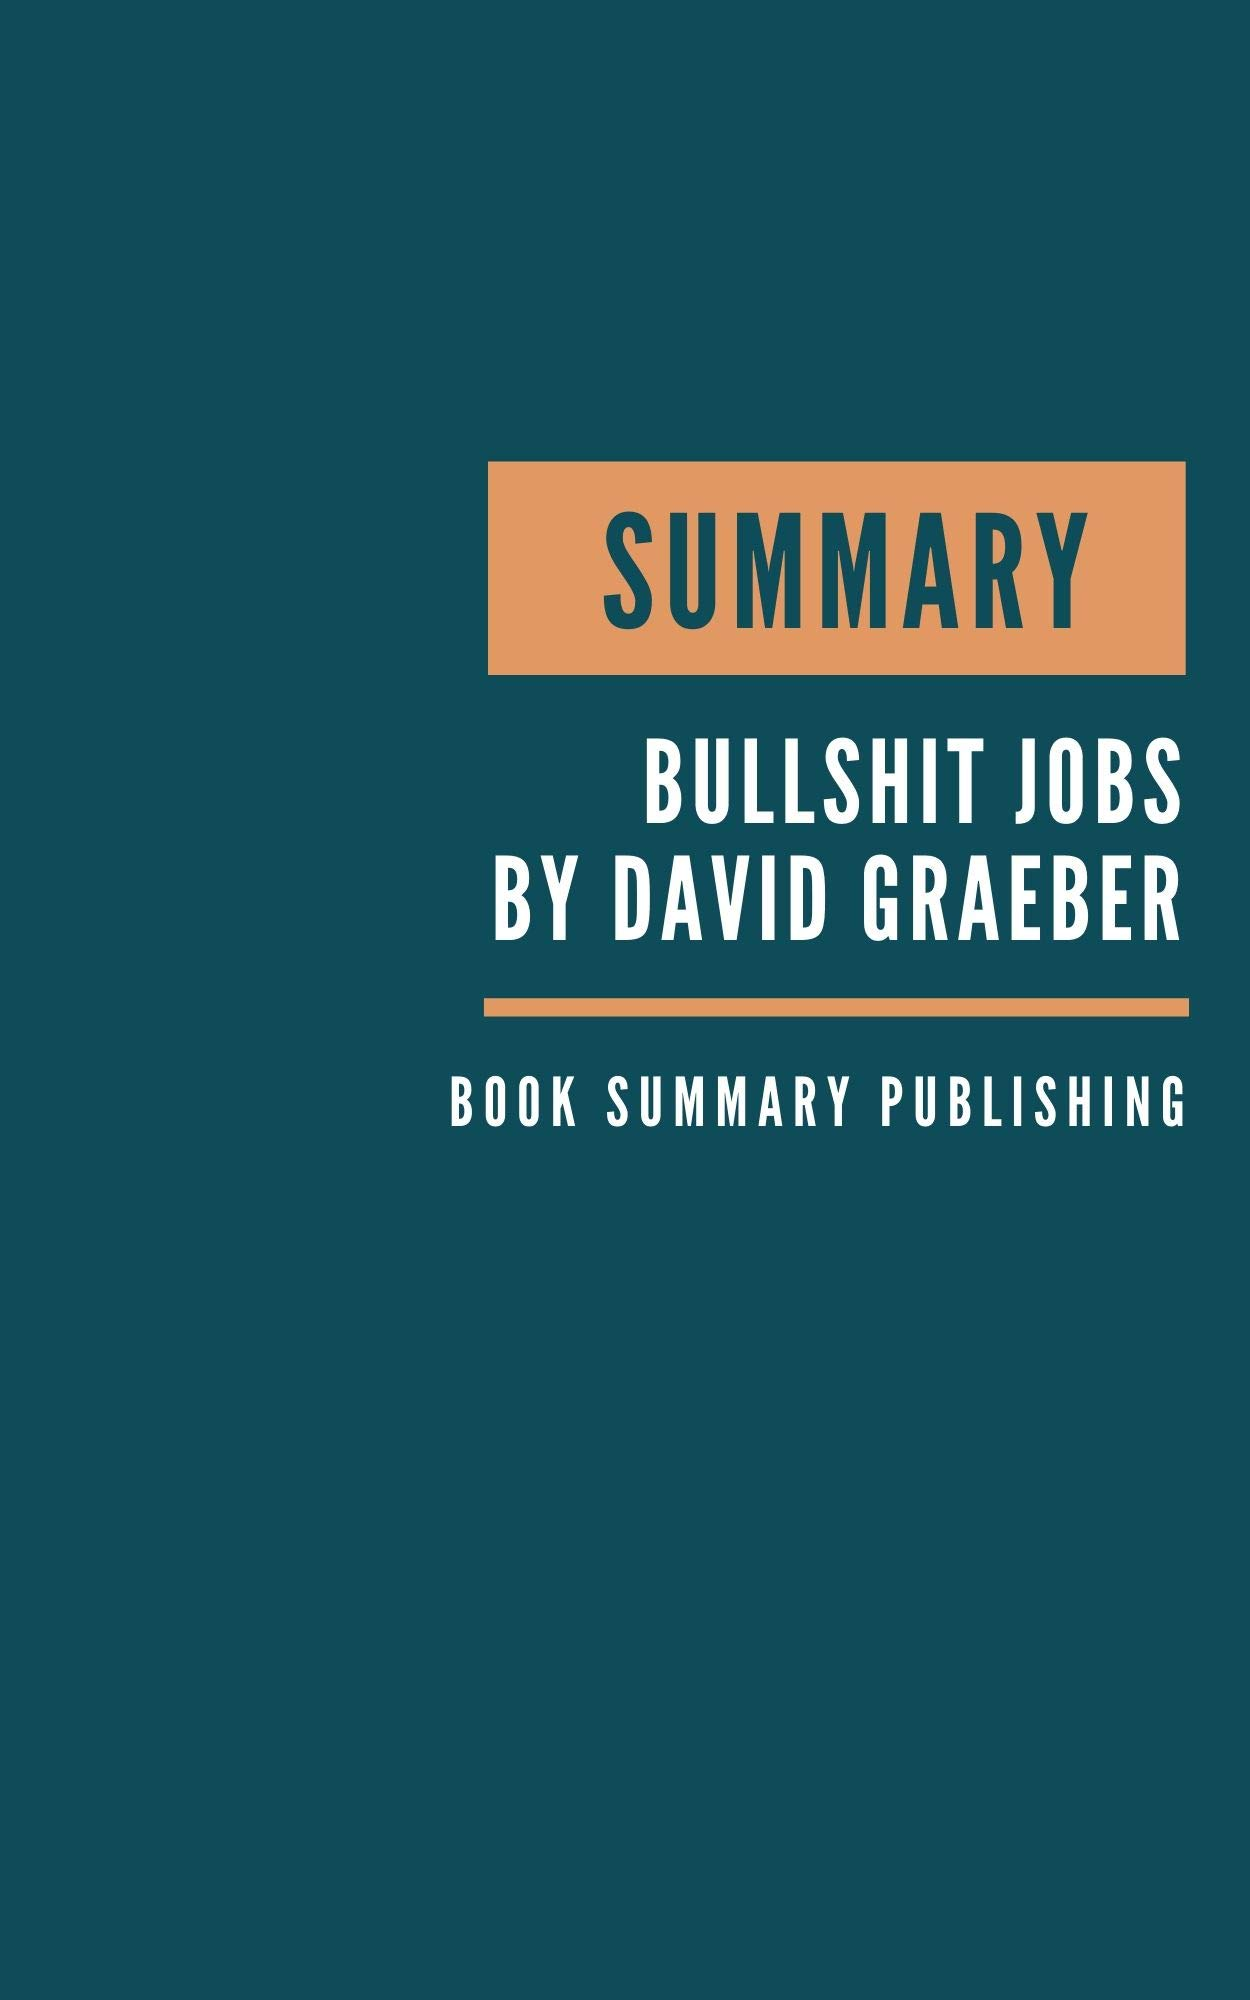 SUMMARY: Bullshit Jobs Summary. David Graeber's Book. Meaningful job. Meaningful work. David Graeber Bullshit Jobs. Book Summary